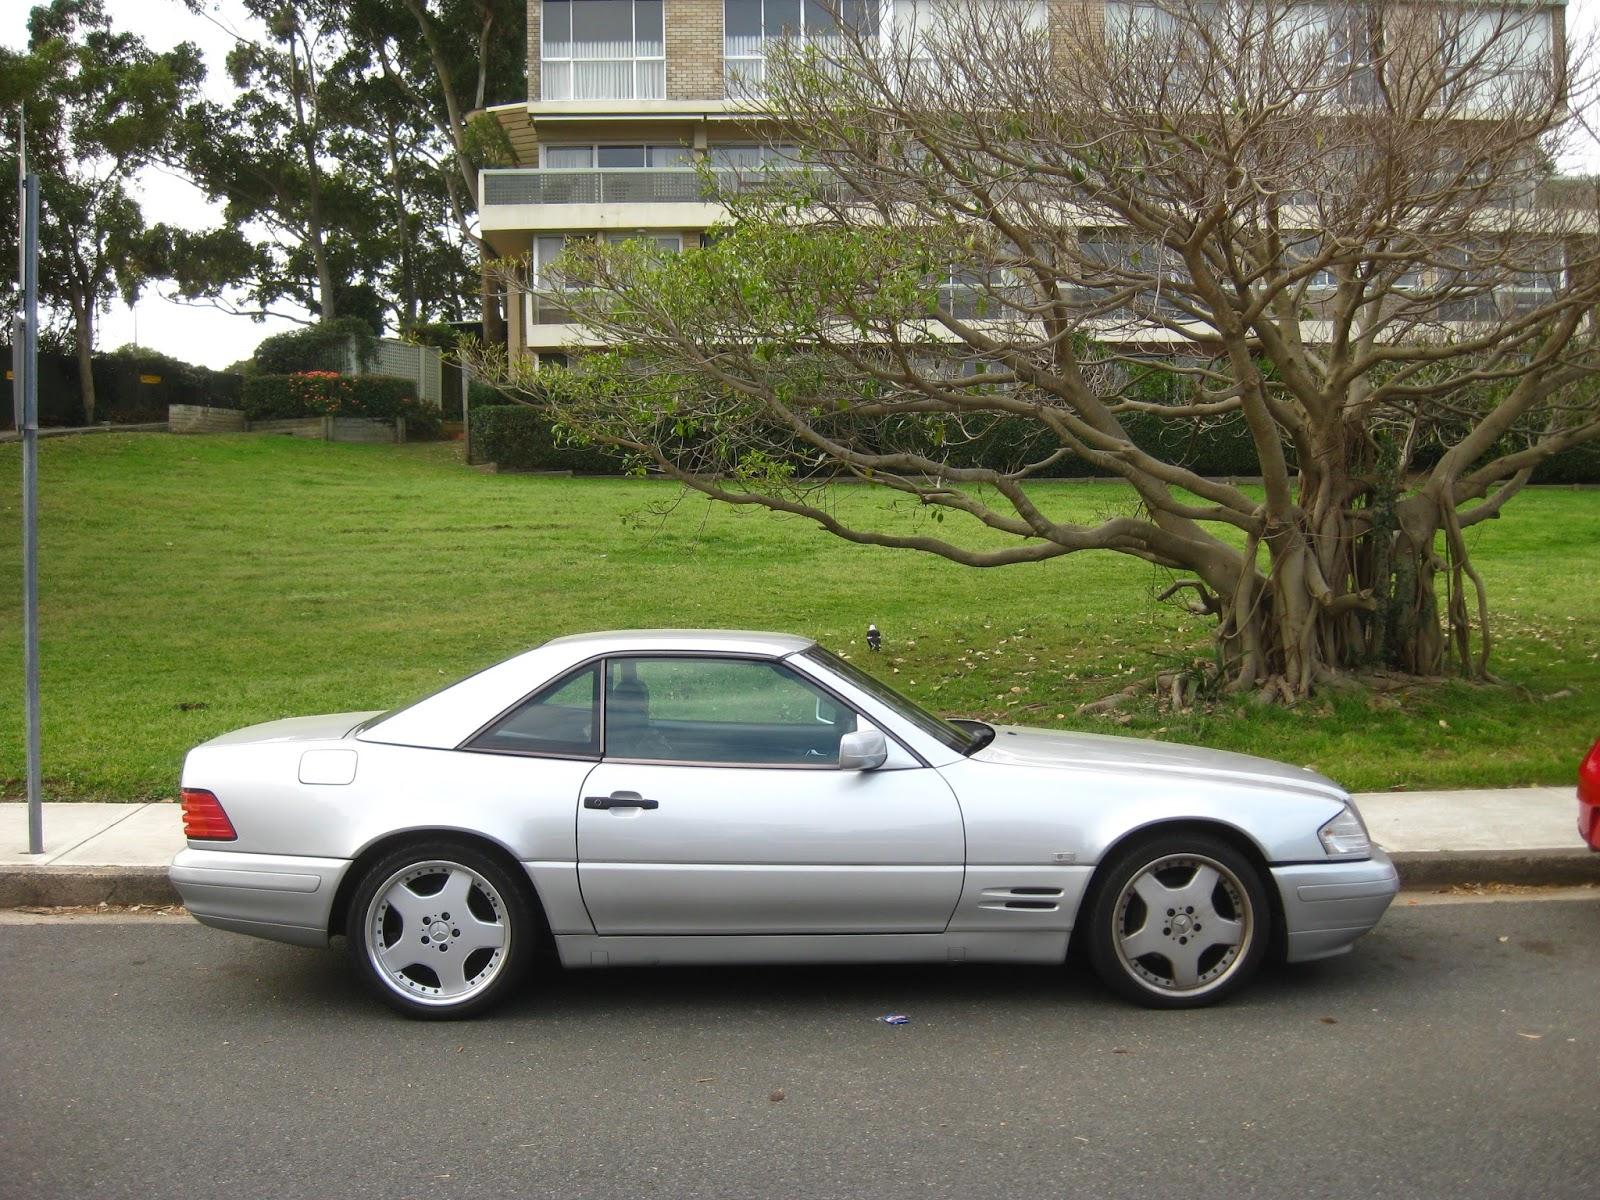 aussie old parked cars 1996 mercedes benz r129 sl500. Black Bedroom Furniture Sets. Home Design Ideas